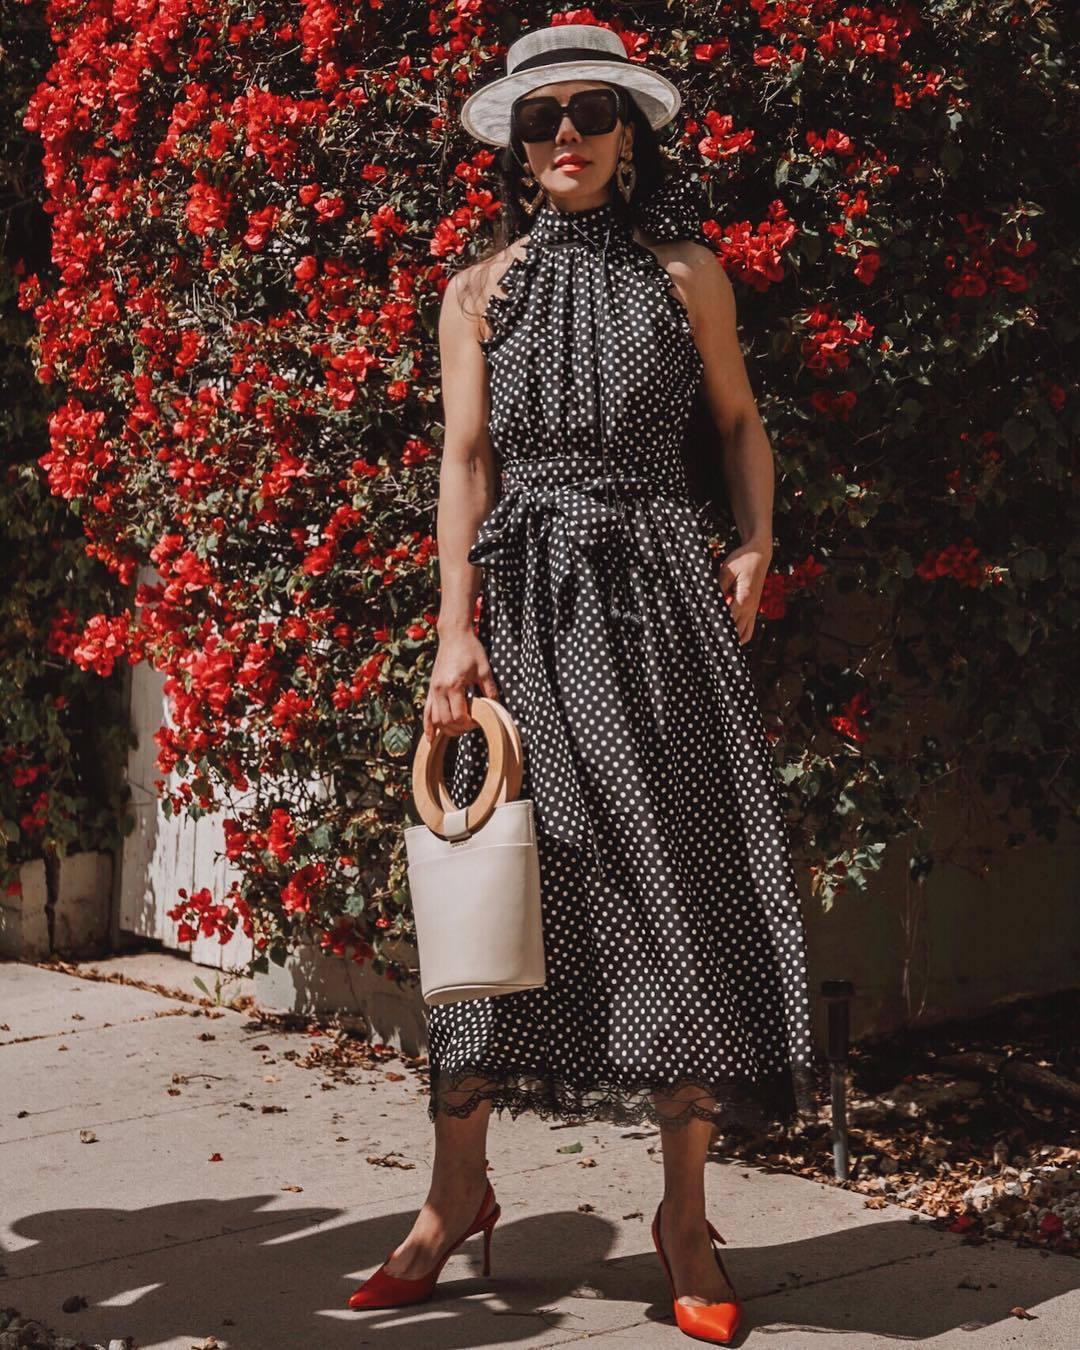 dress midi dress polka dots black dress slingbacks handbag hat sunglasses